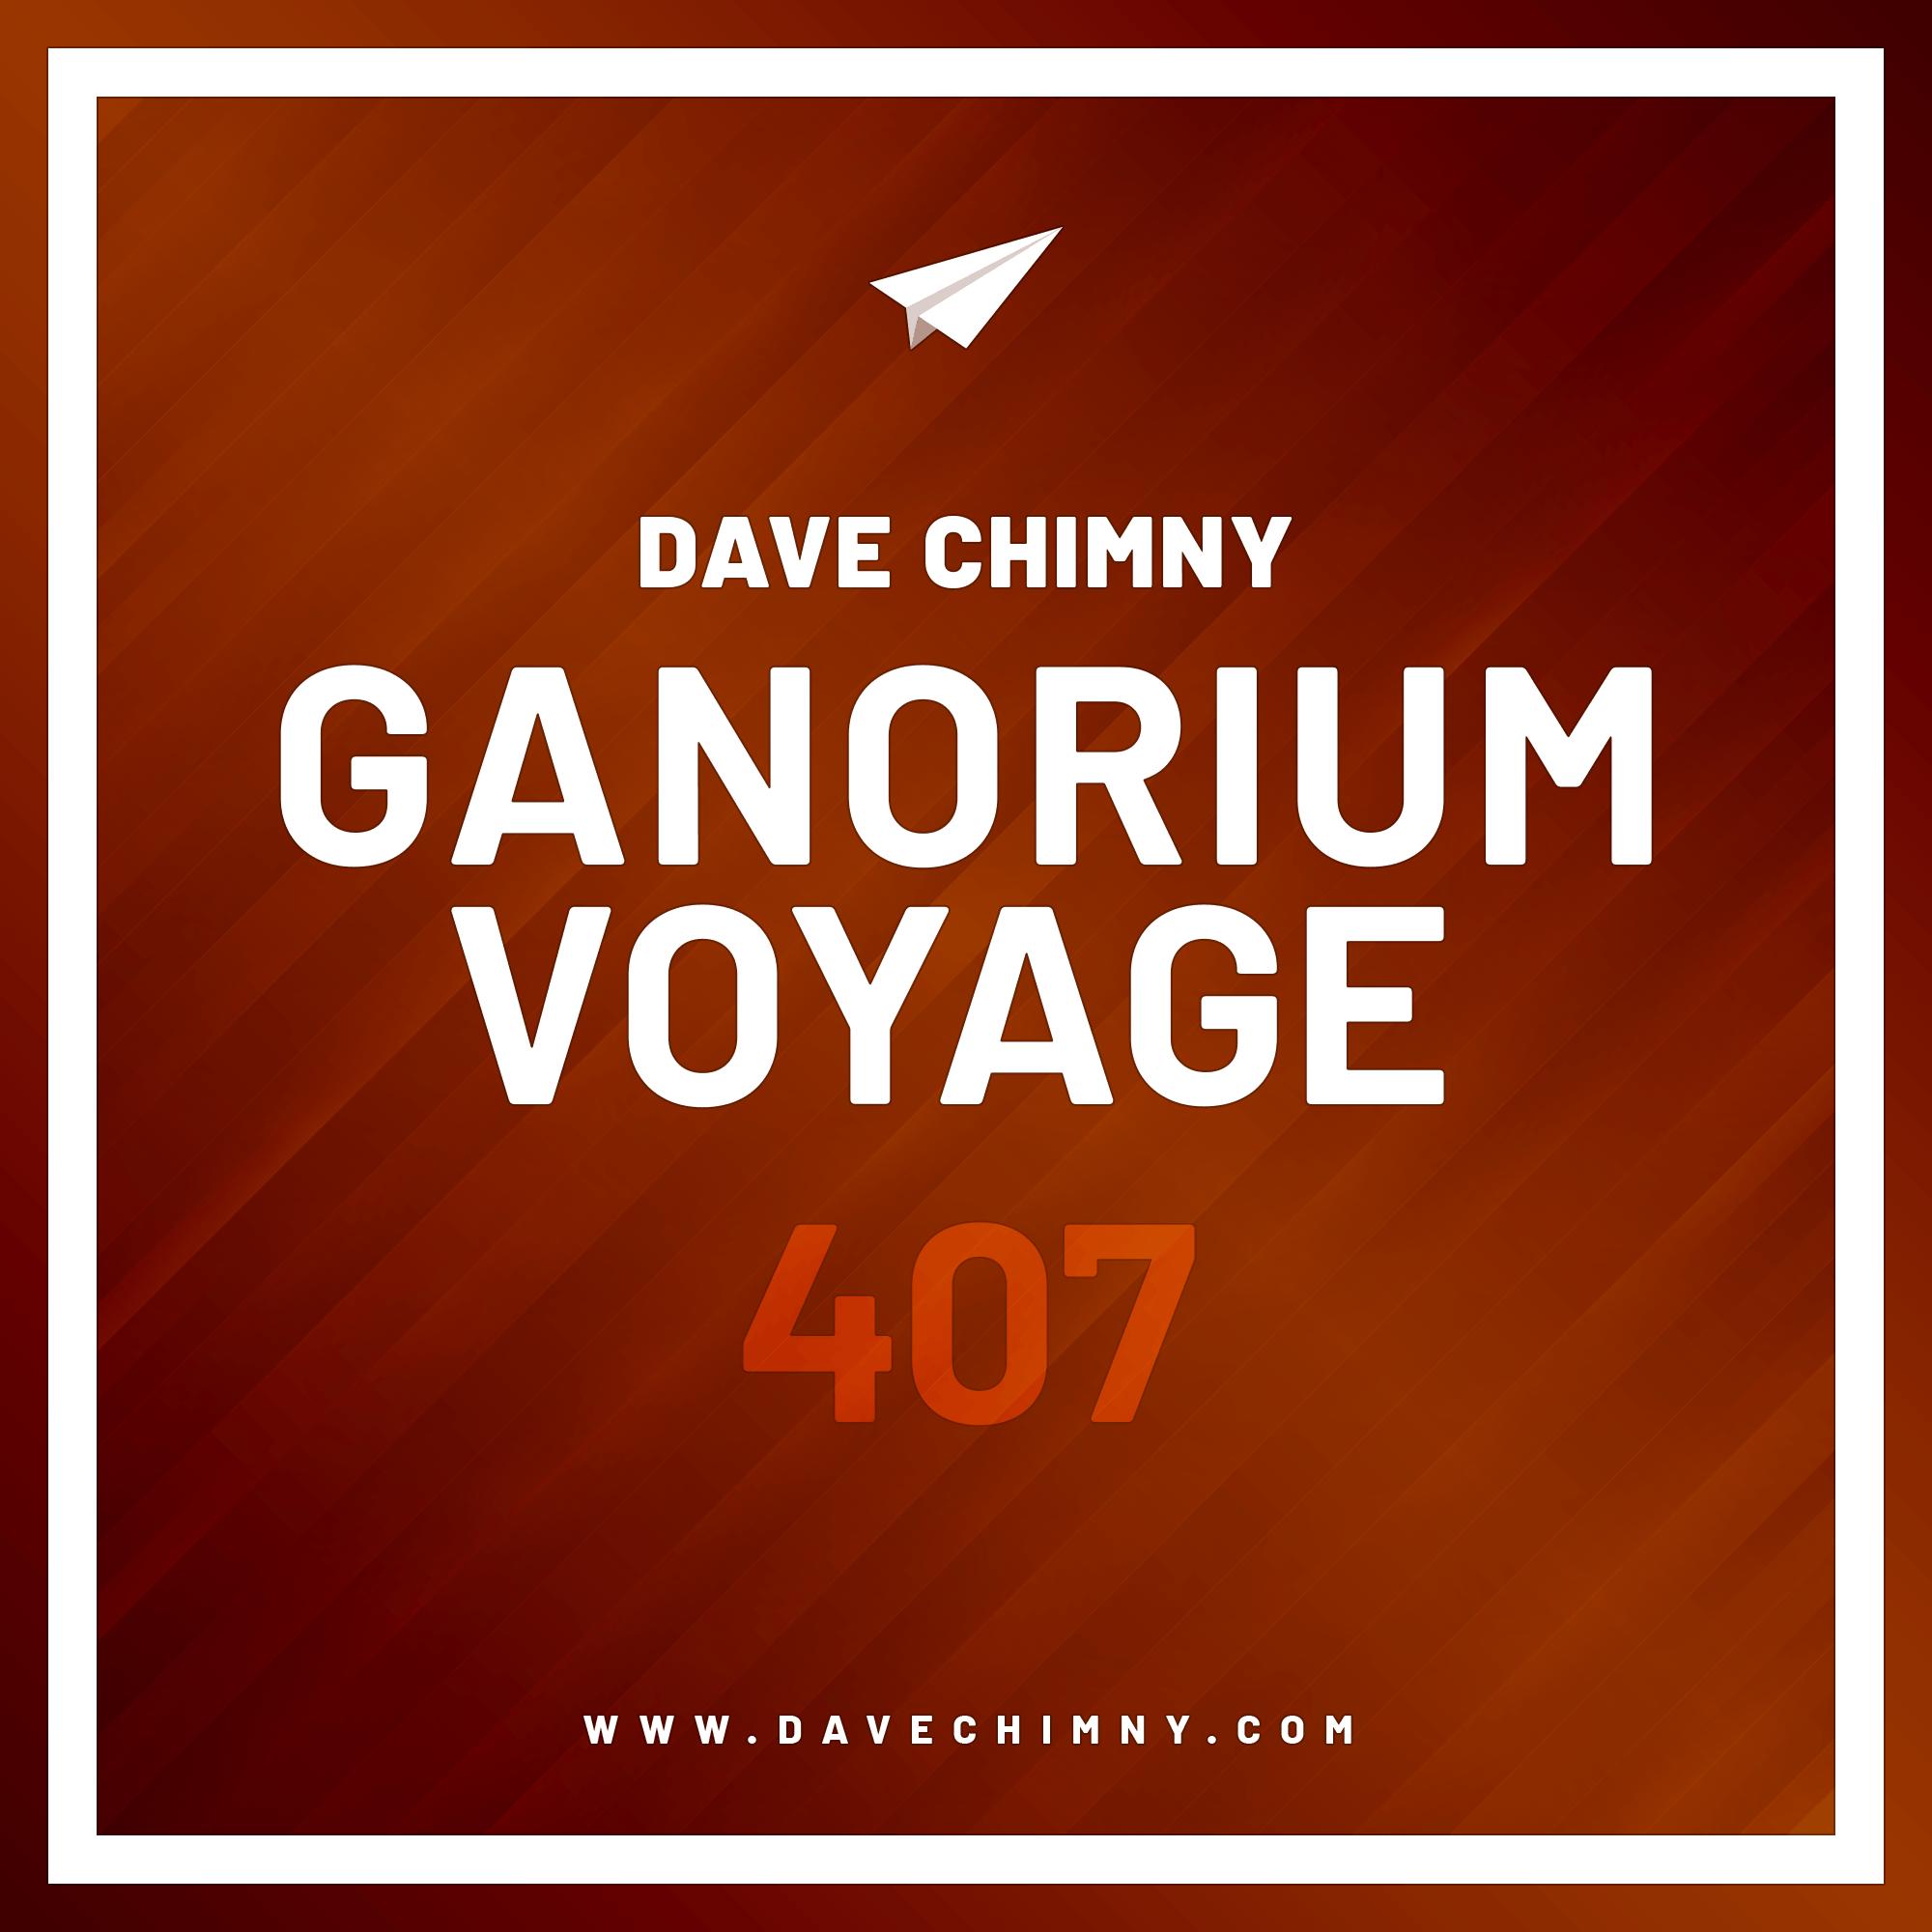 Dave Chimny – Ganorium Voyage 407